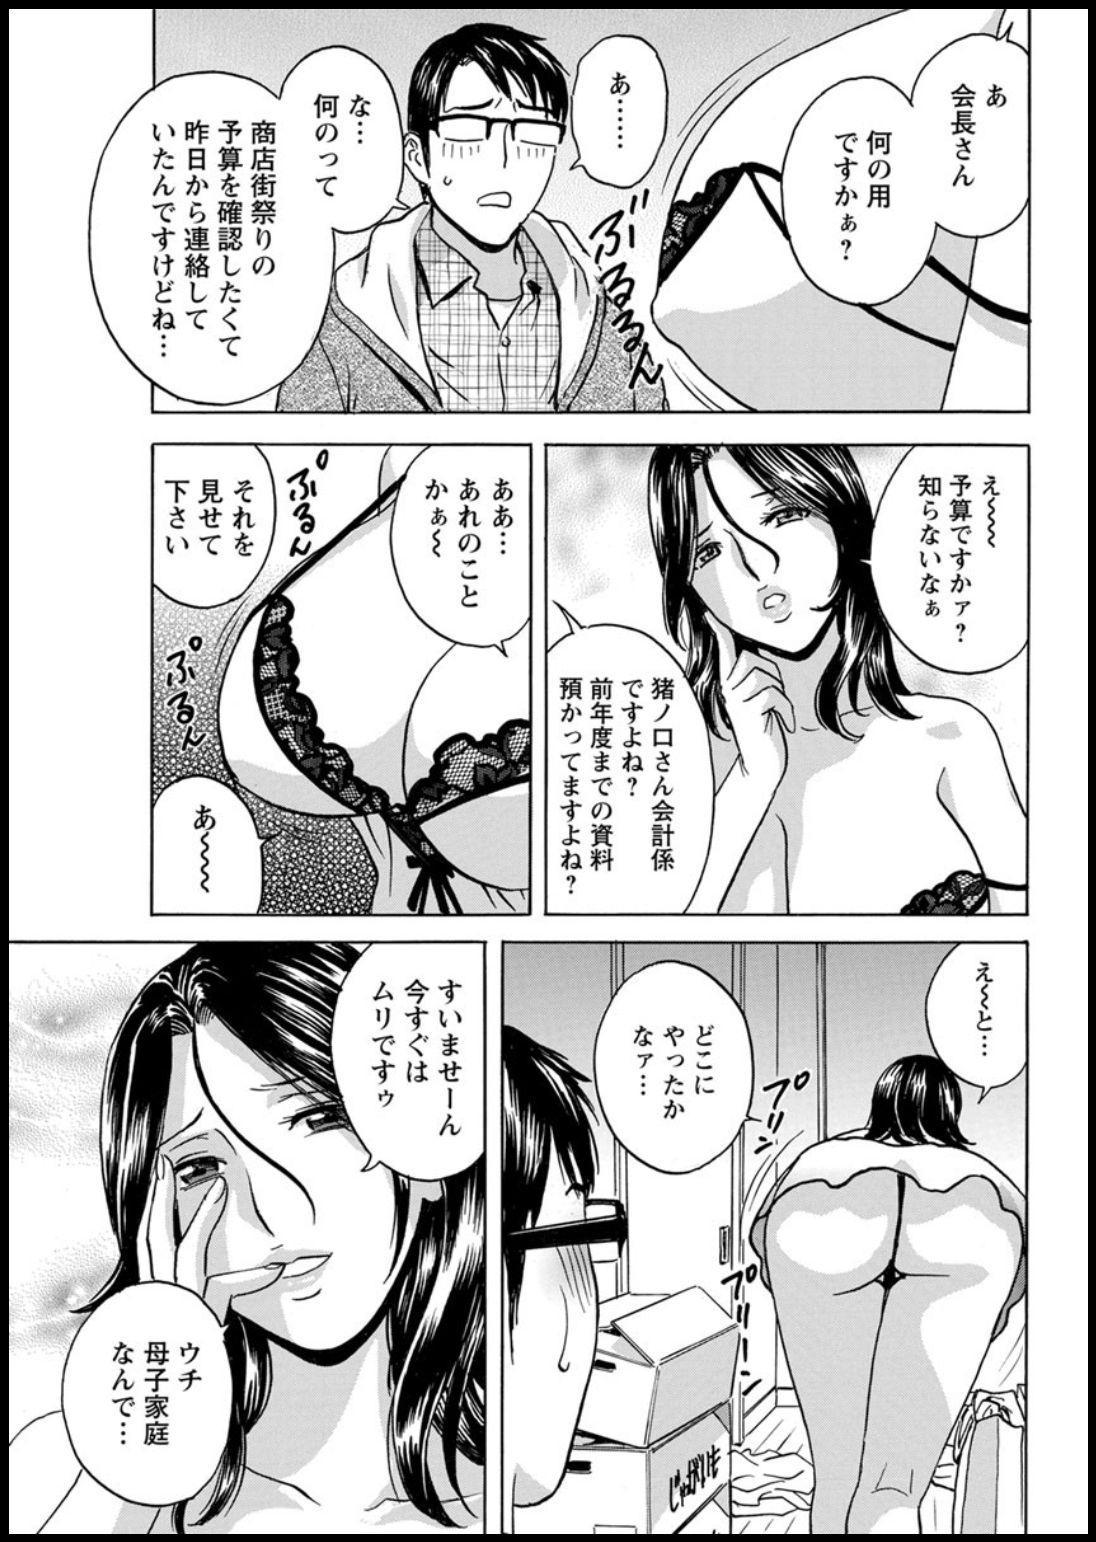 [Hidemaru] Yurase Bikyonyuu! Hataraku J-Cup Ch. 1-5 [Digital] 40